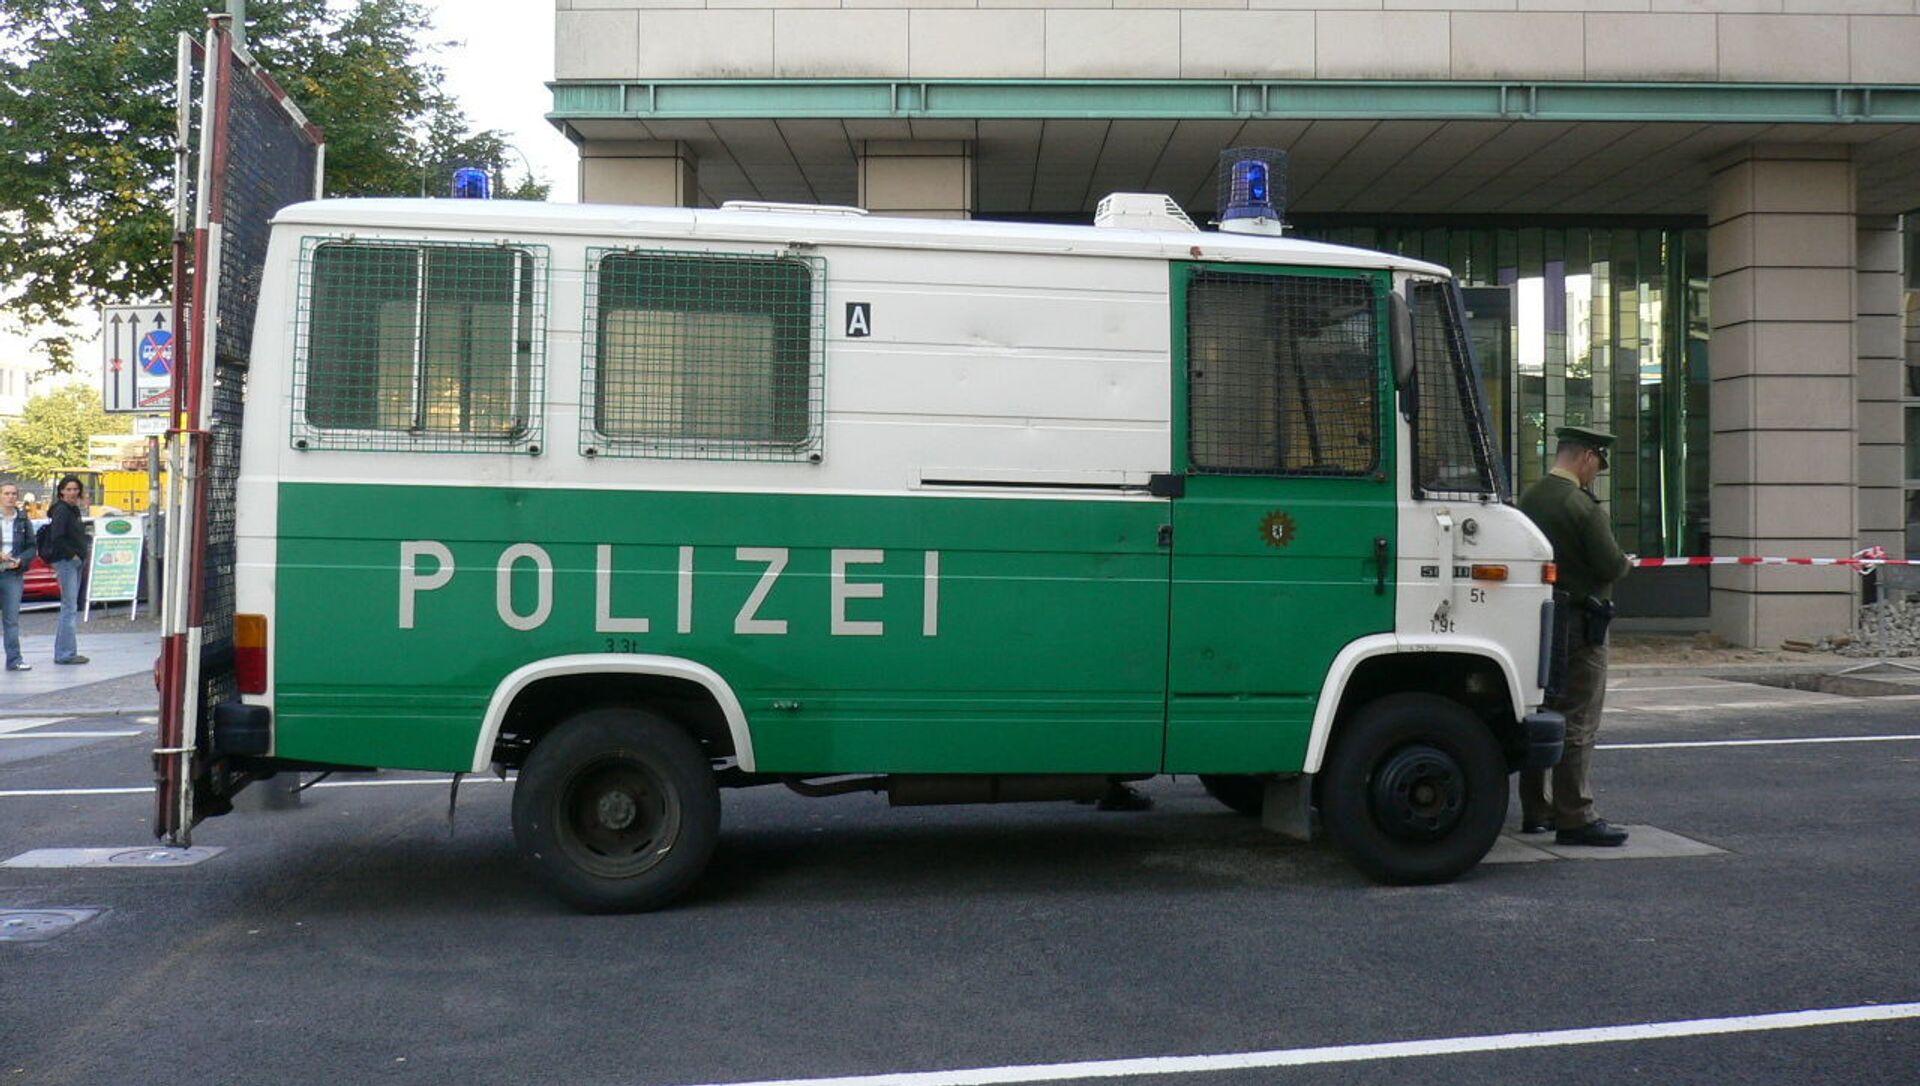 Un véhicule de police à Berlin (image d'illustration) - Sputnik France, 1920, 02.08.2021